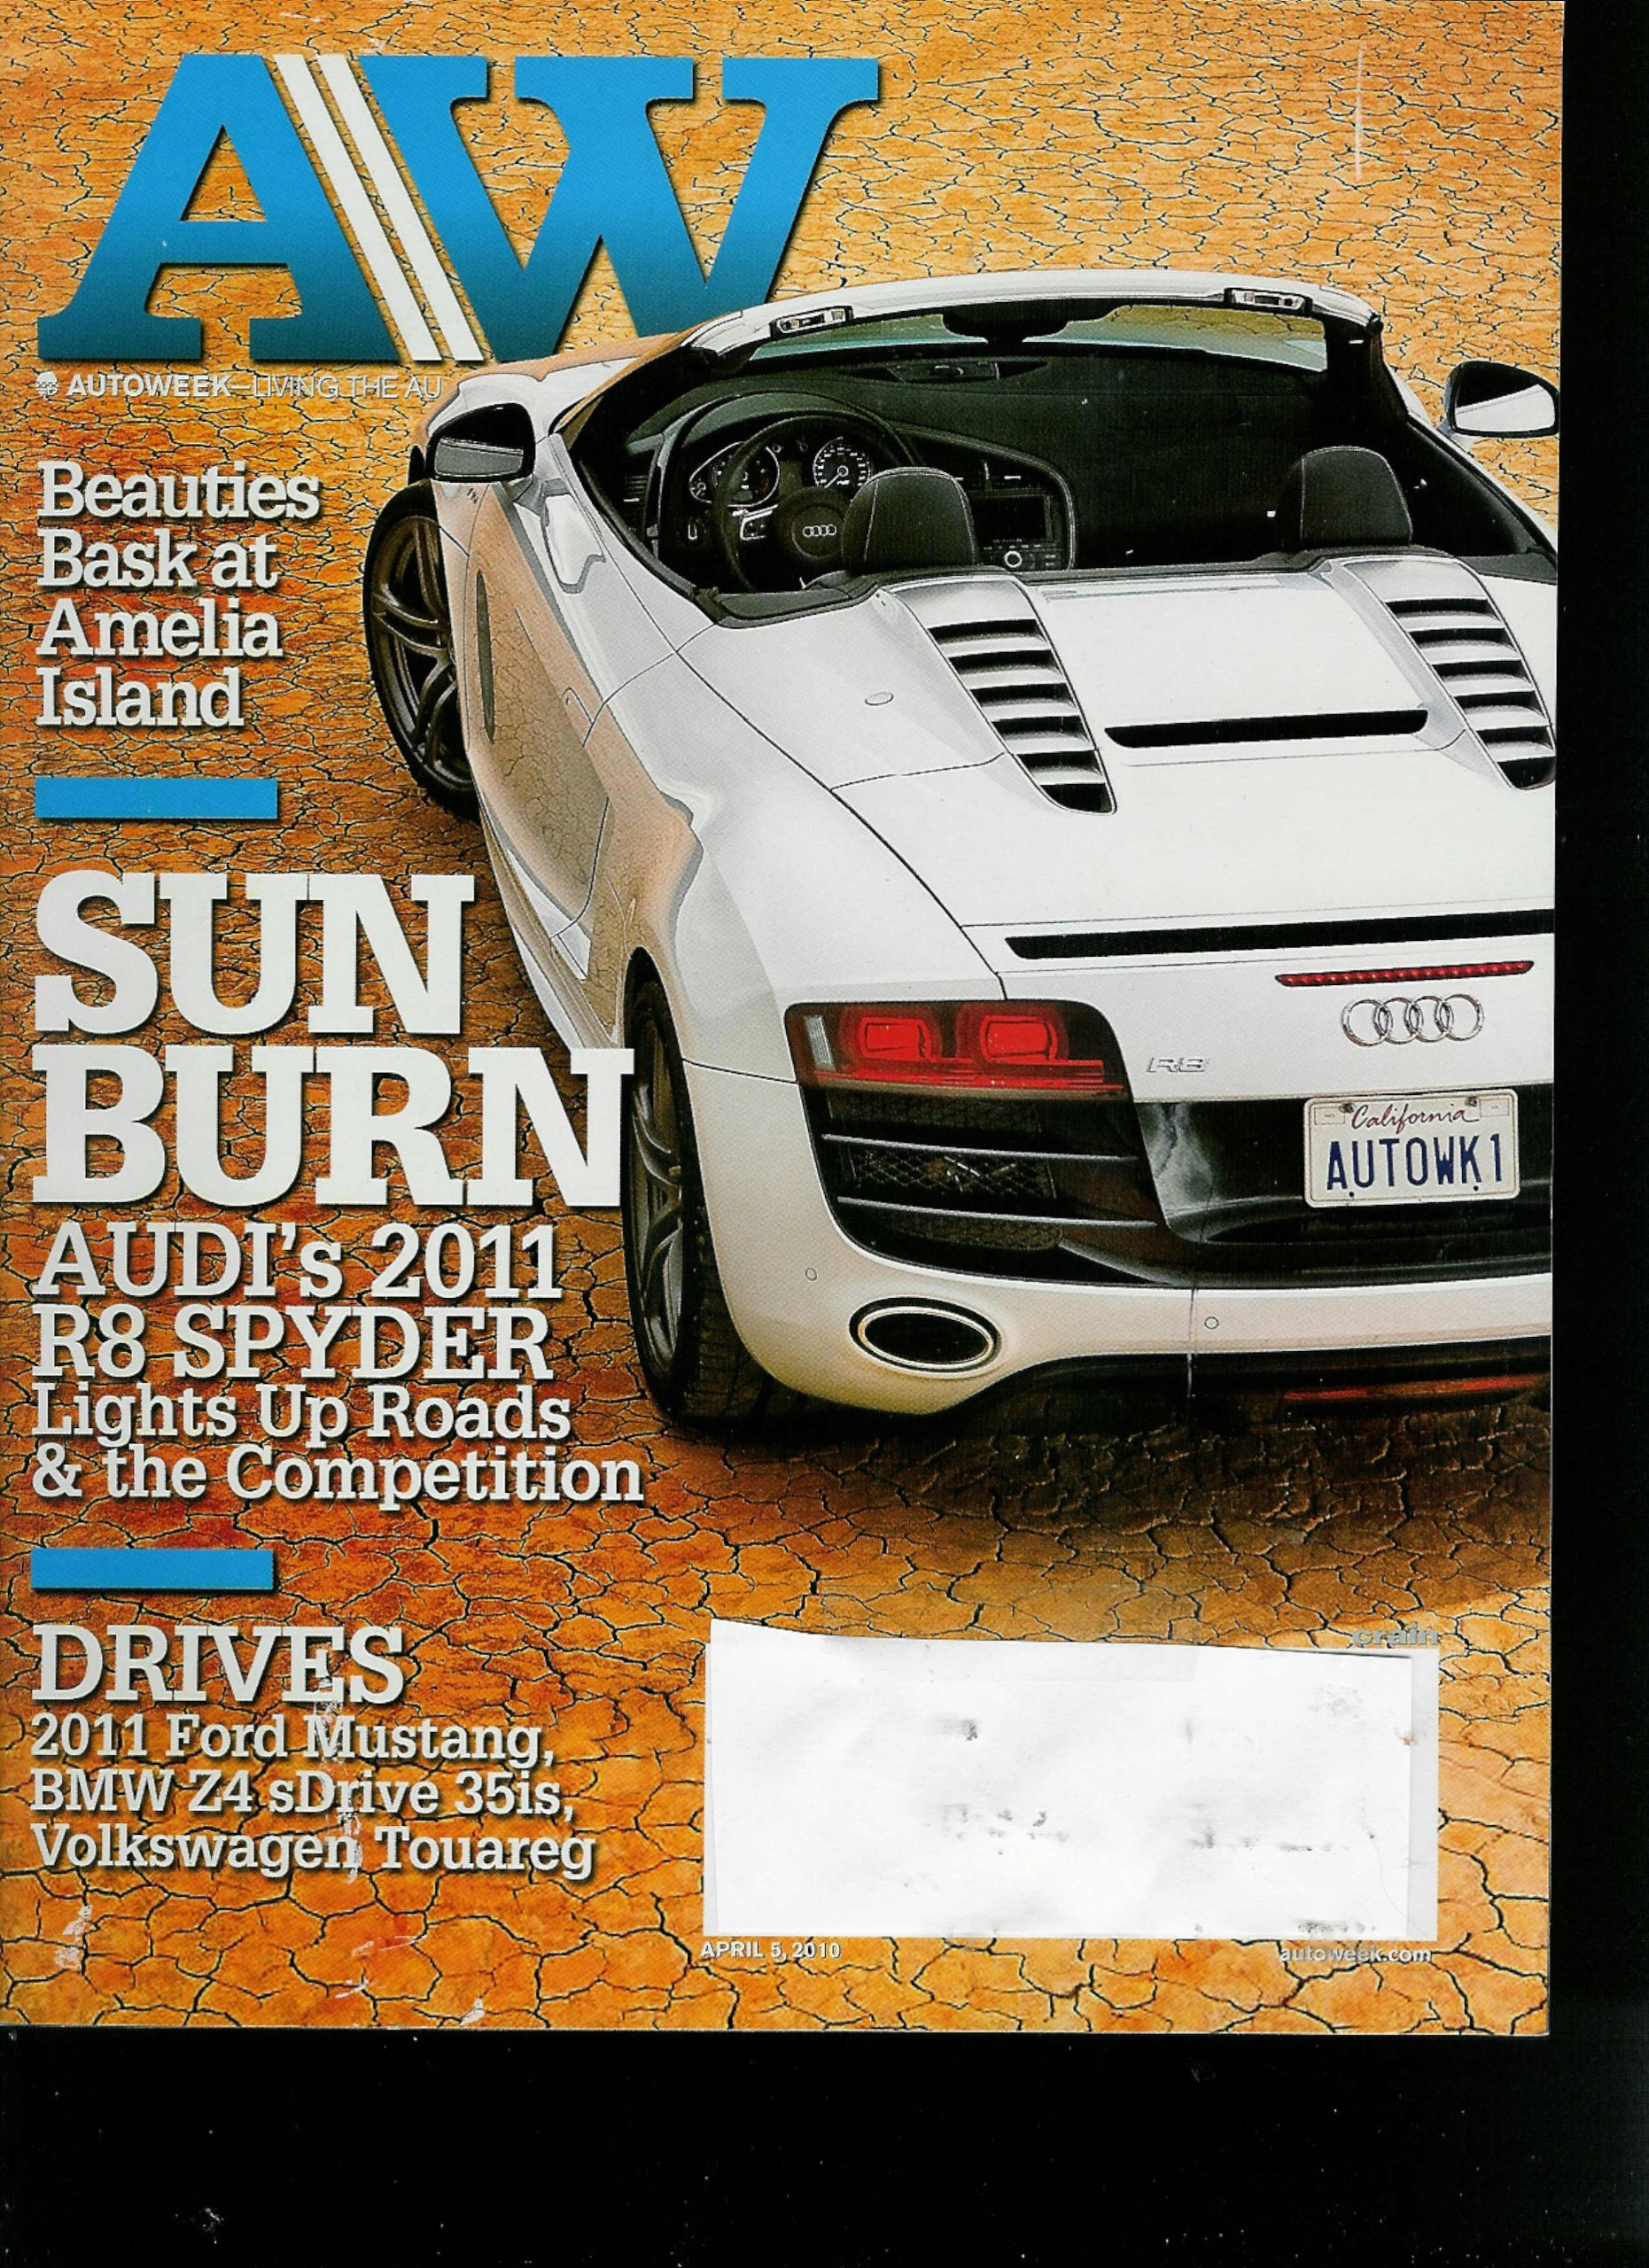 Read Online AutoWeek April 5, 2010 Volume 60 Issue 7 Beauties Bask At Amelia Island / Sun Burn* Audi's 2011 R8 Spyder PDF